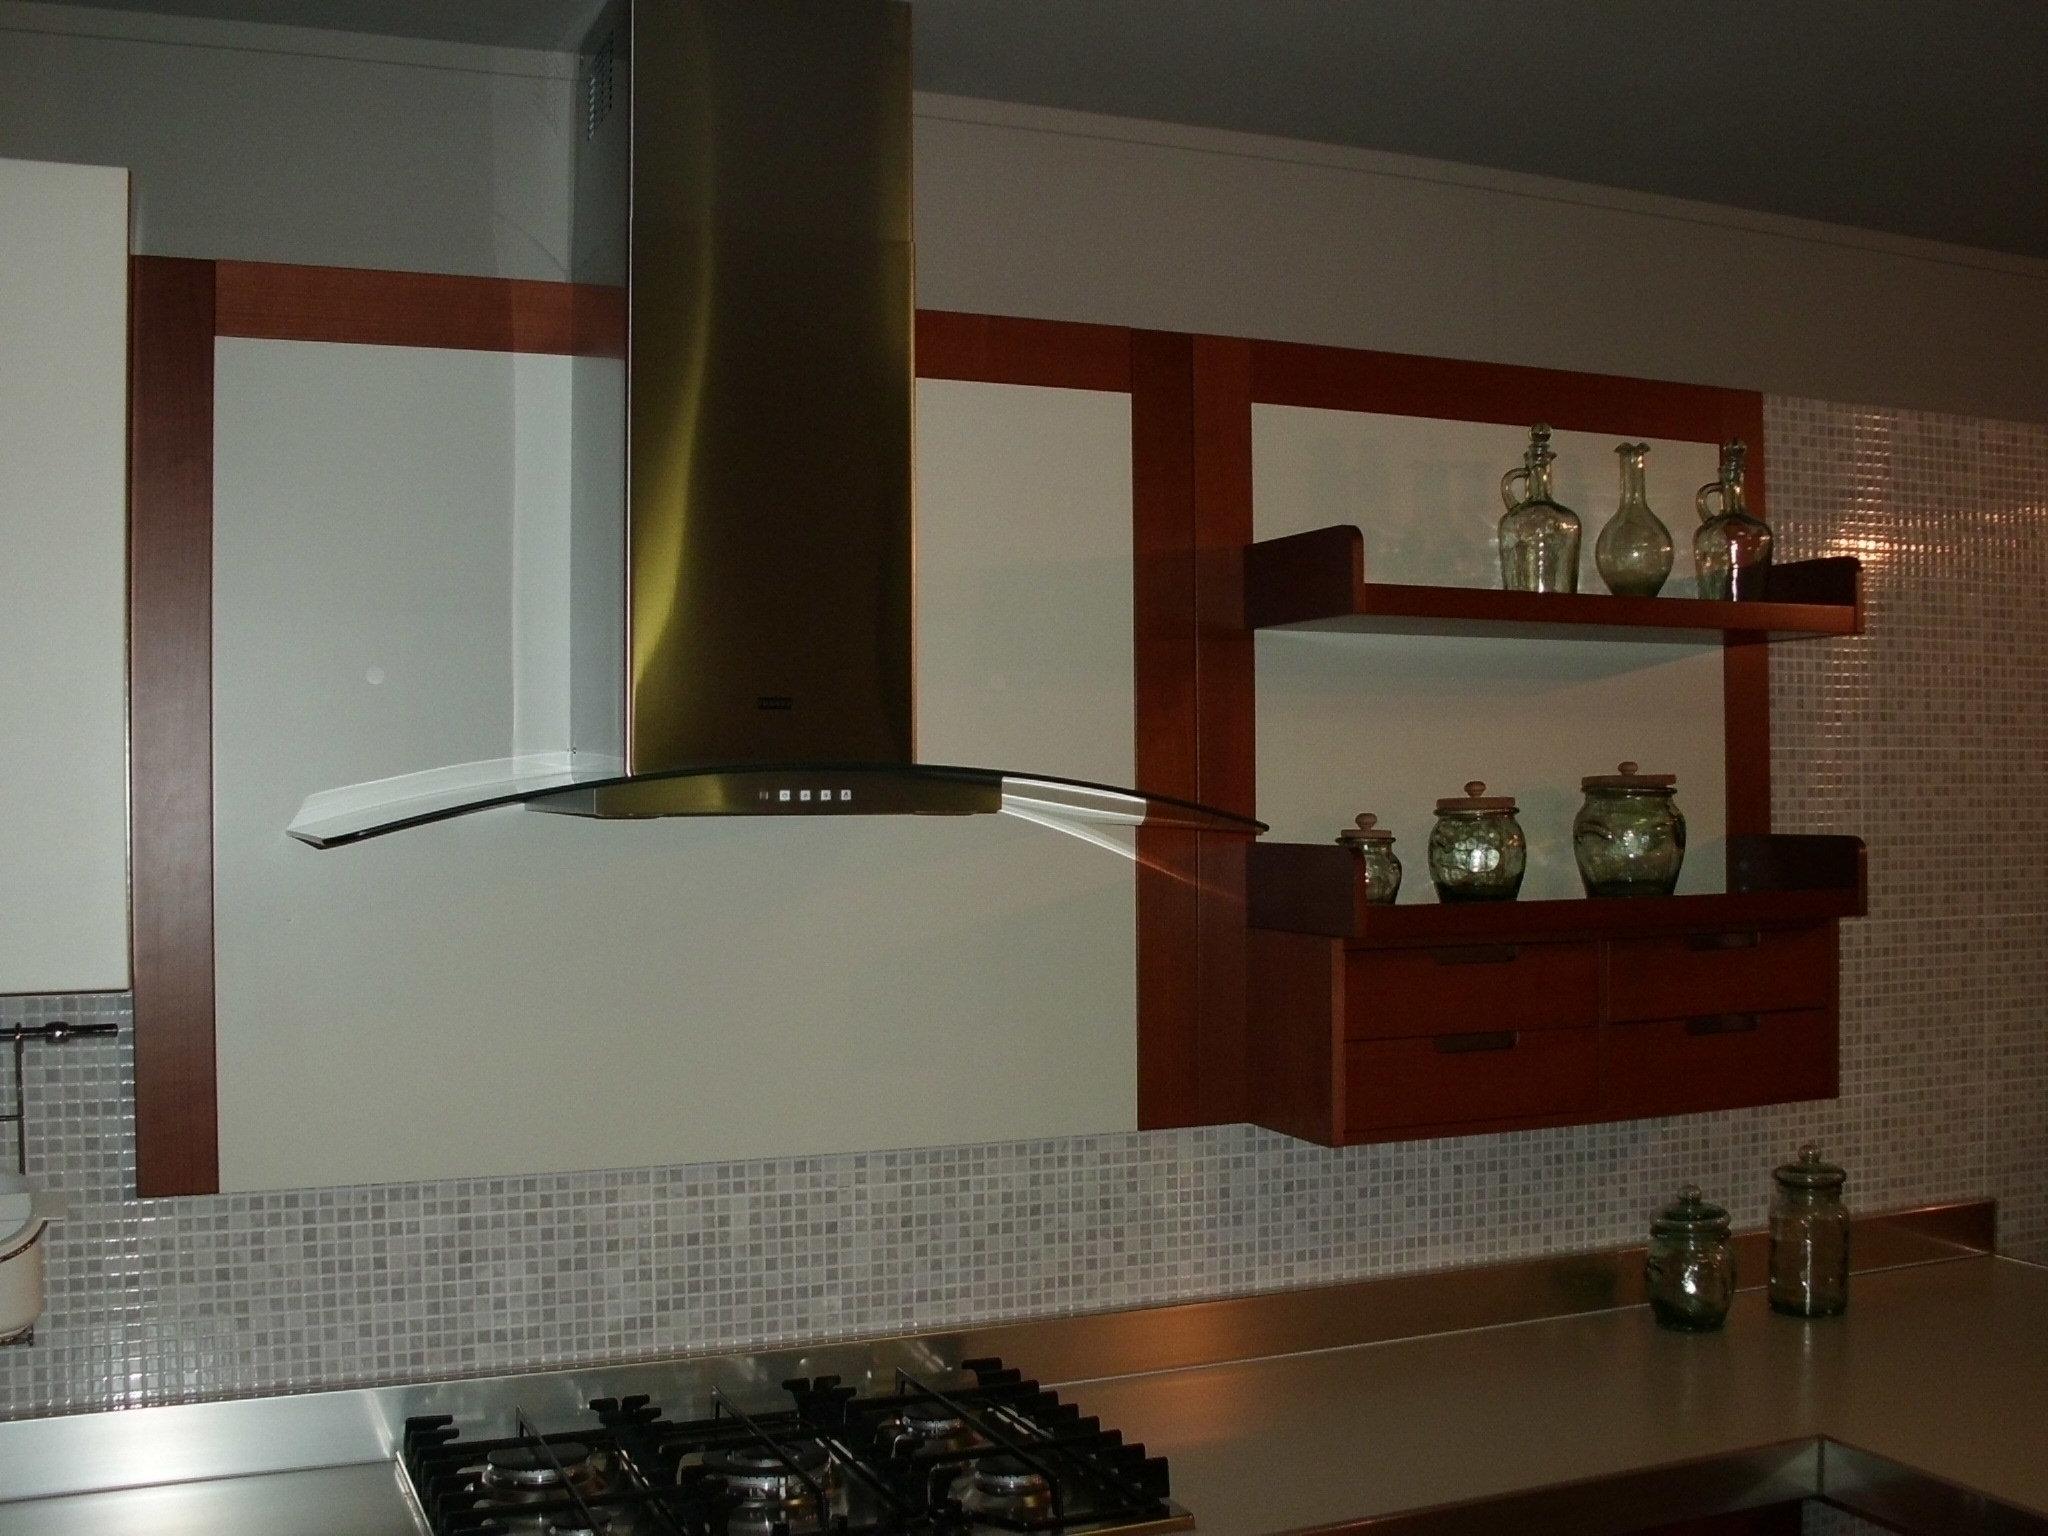 Stunning Comprex Cucine Prezzi Photos - acrylicgiftware.us ...